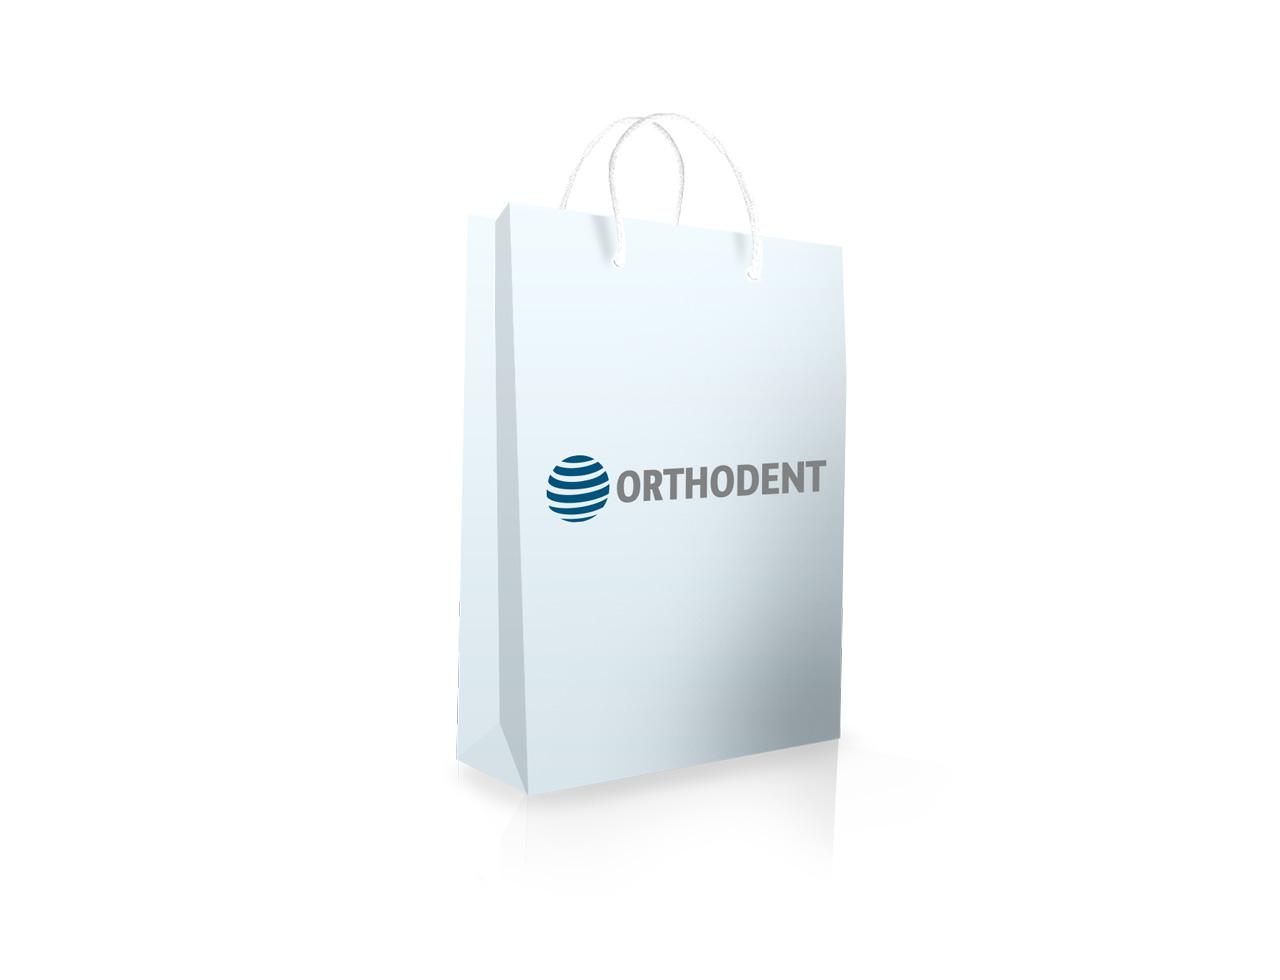 orthodent-discilik-malzemeleri-logo-tasarim-3